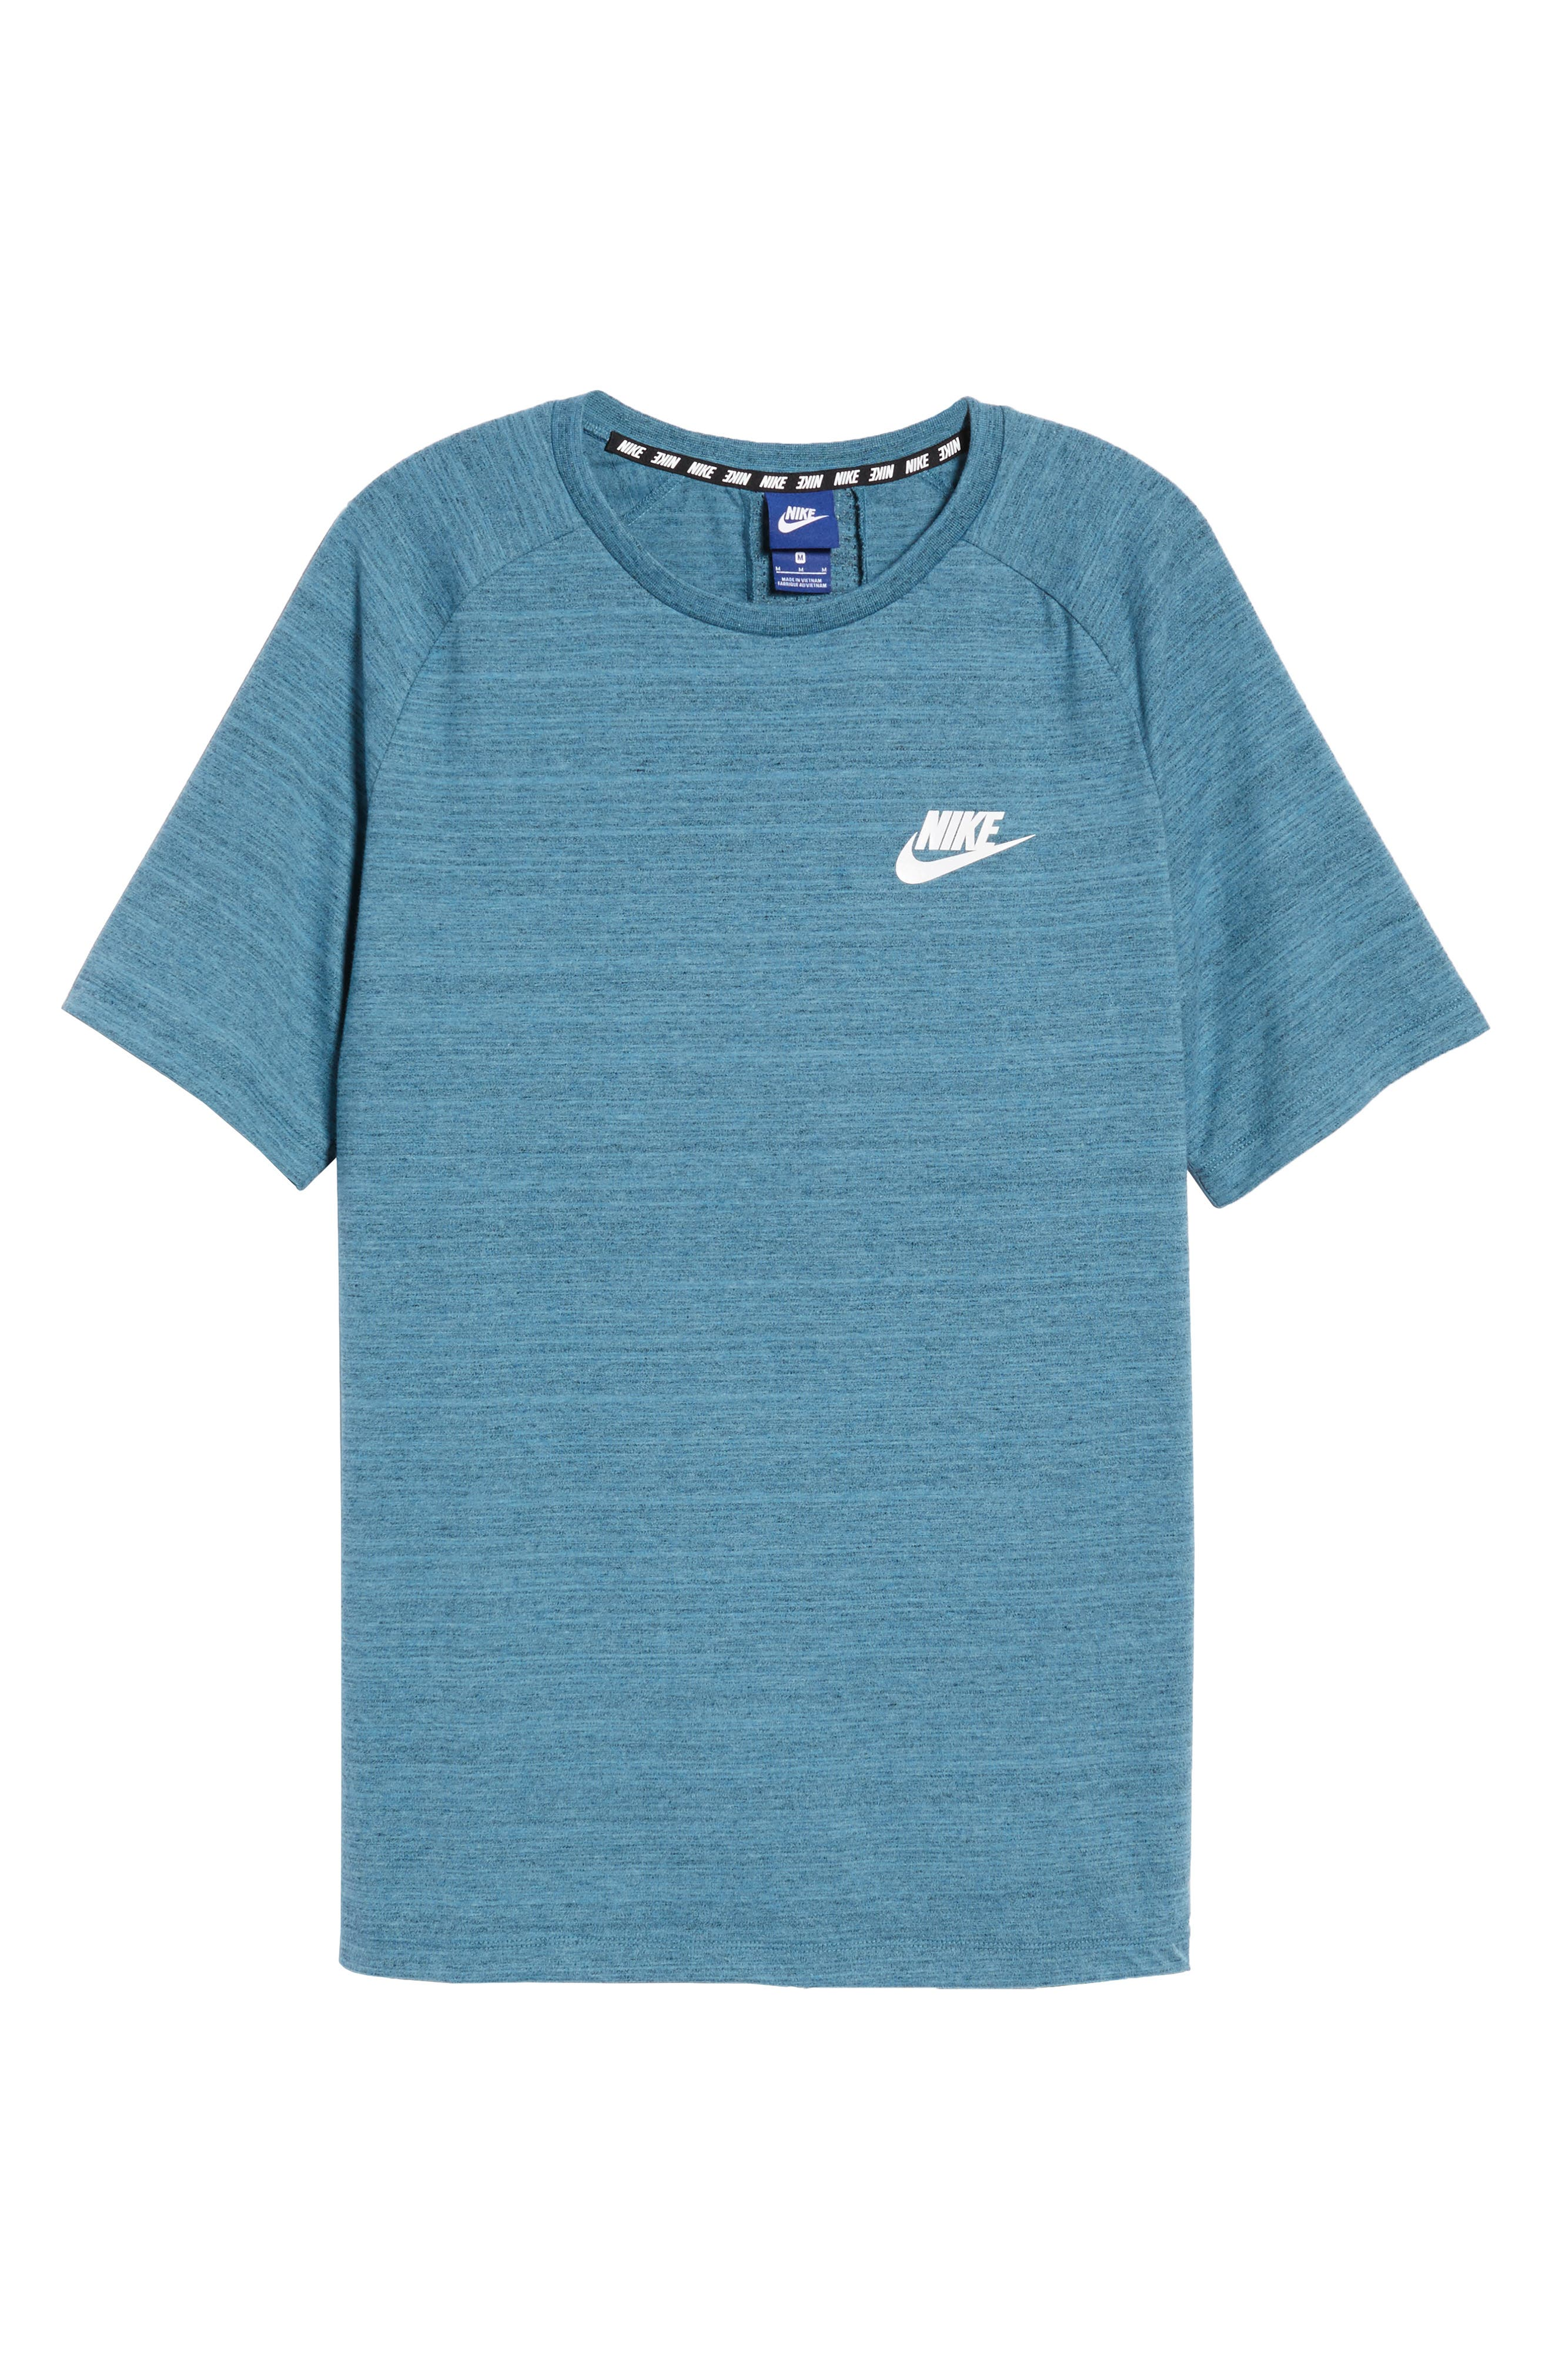 NSW AV15 Crewneck T-Shirt,                             Alternate thumbnail 6, color,                             NOISE AQUA/ HEATHER/ WHITE